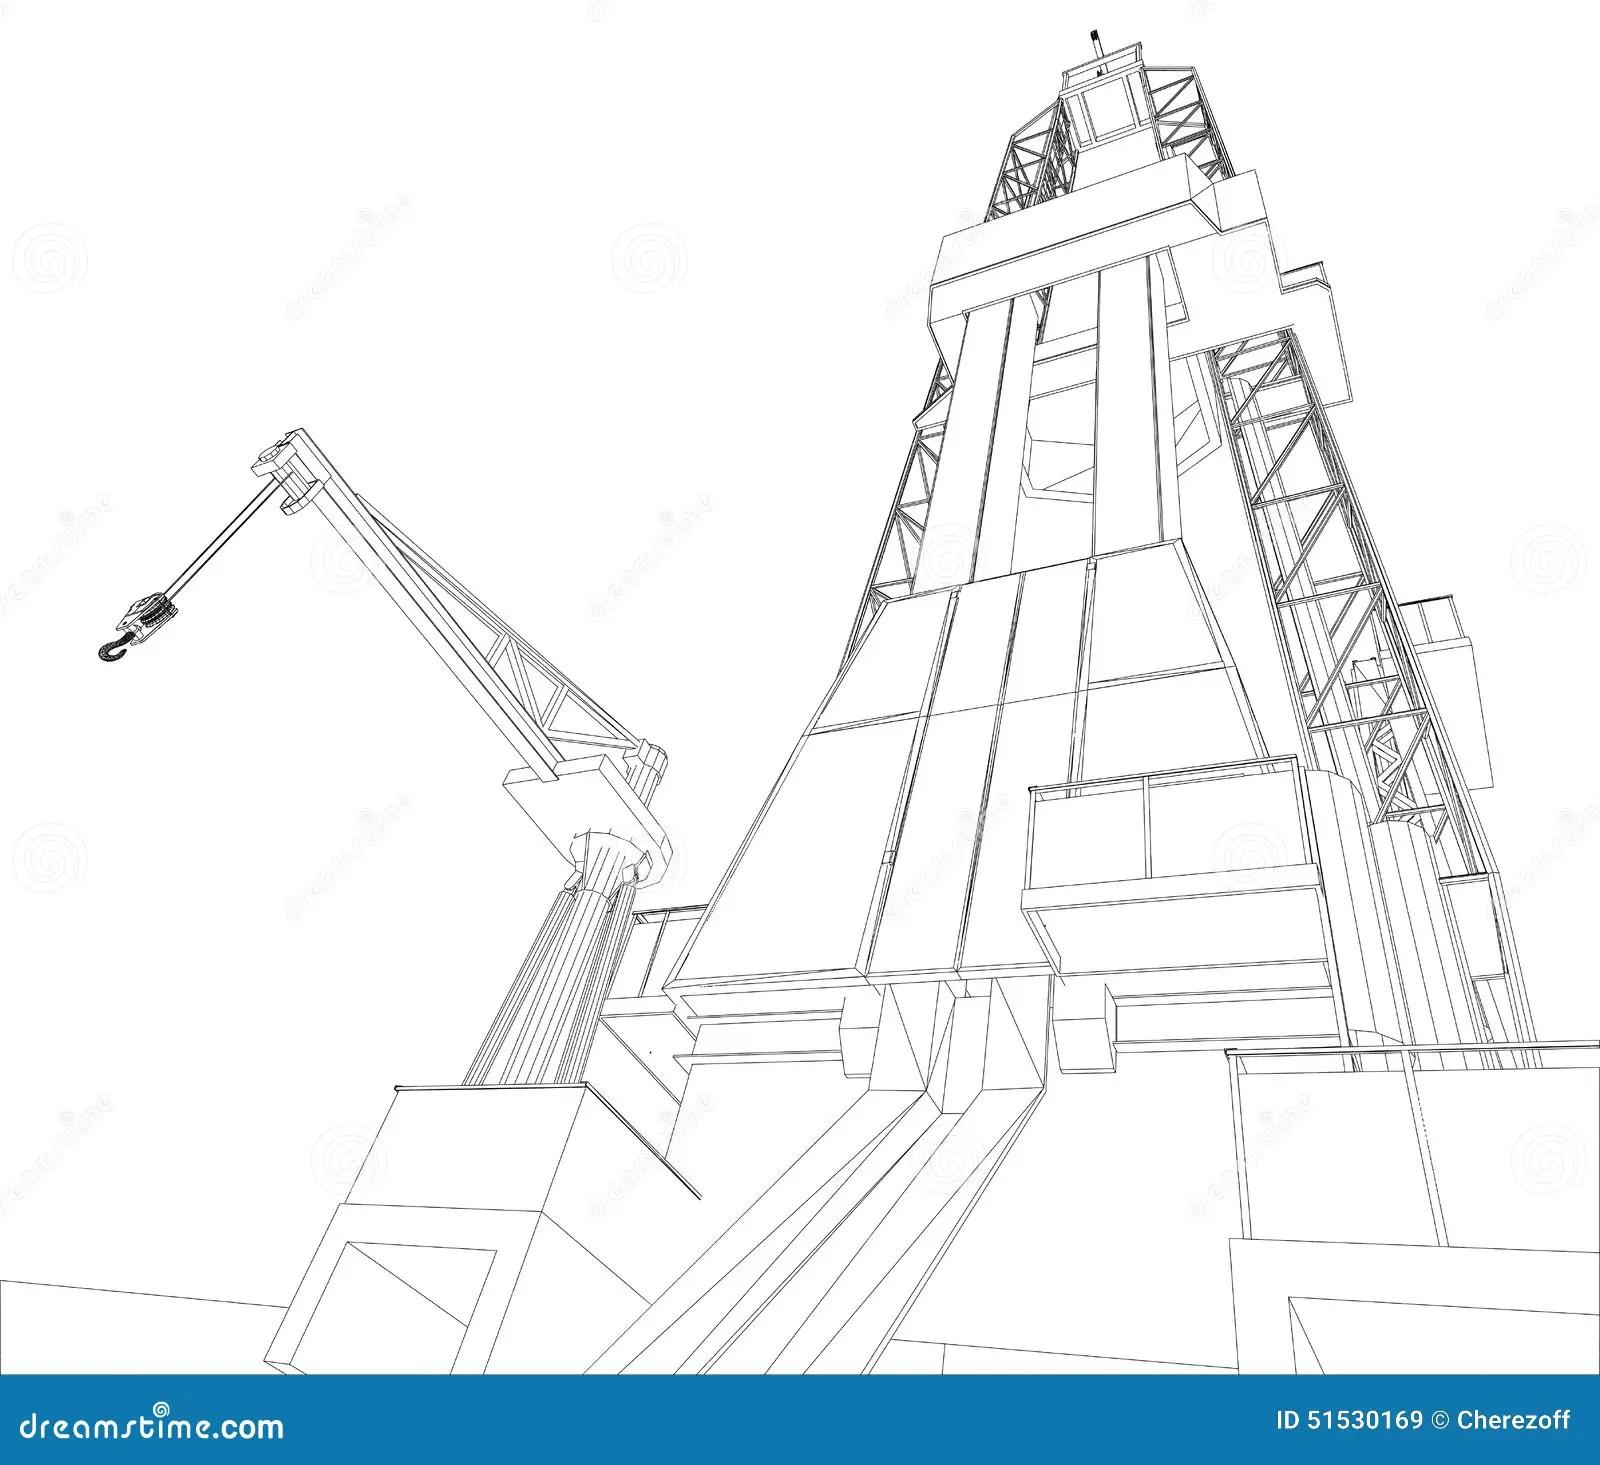 Oil Rig Detailed Vector Illustration Stock Vector